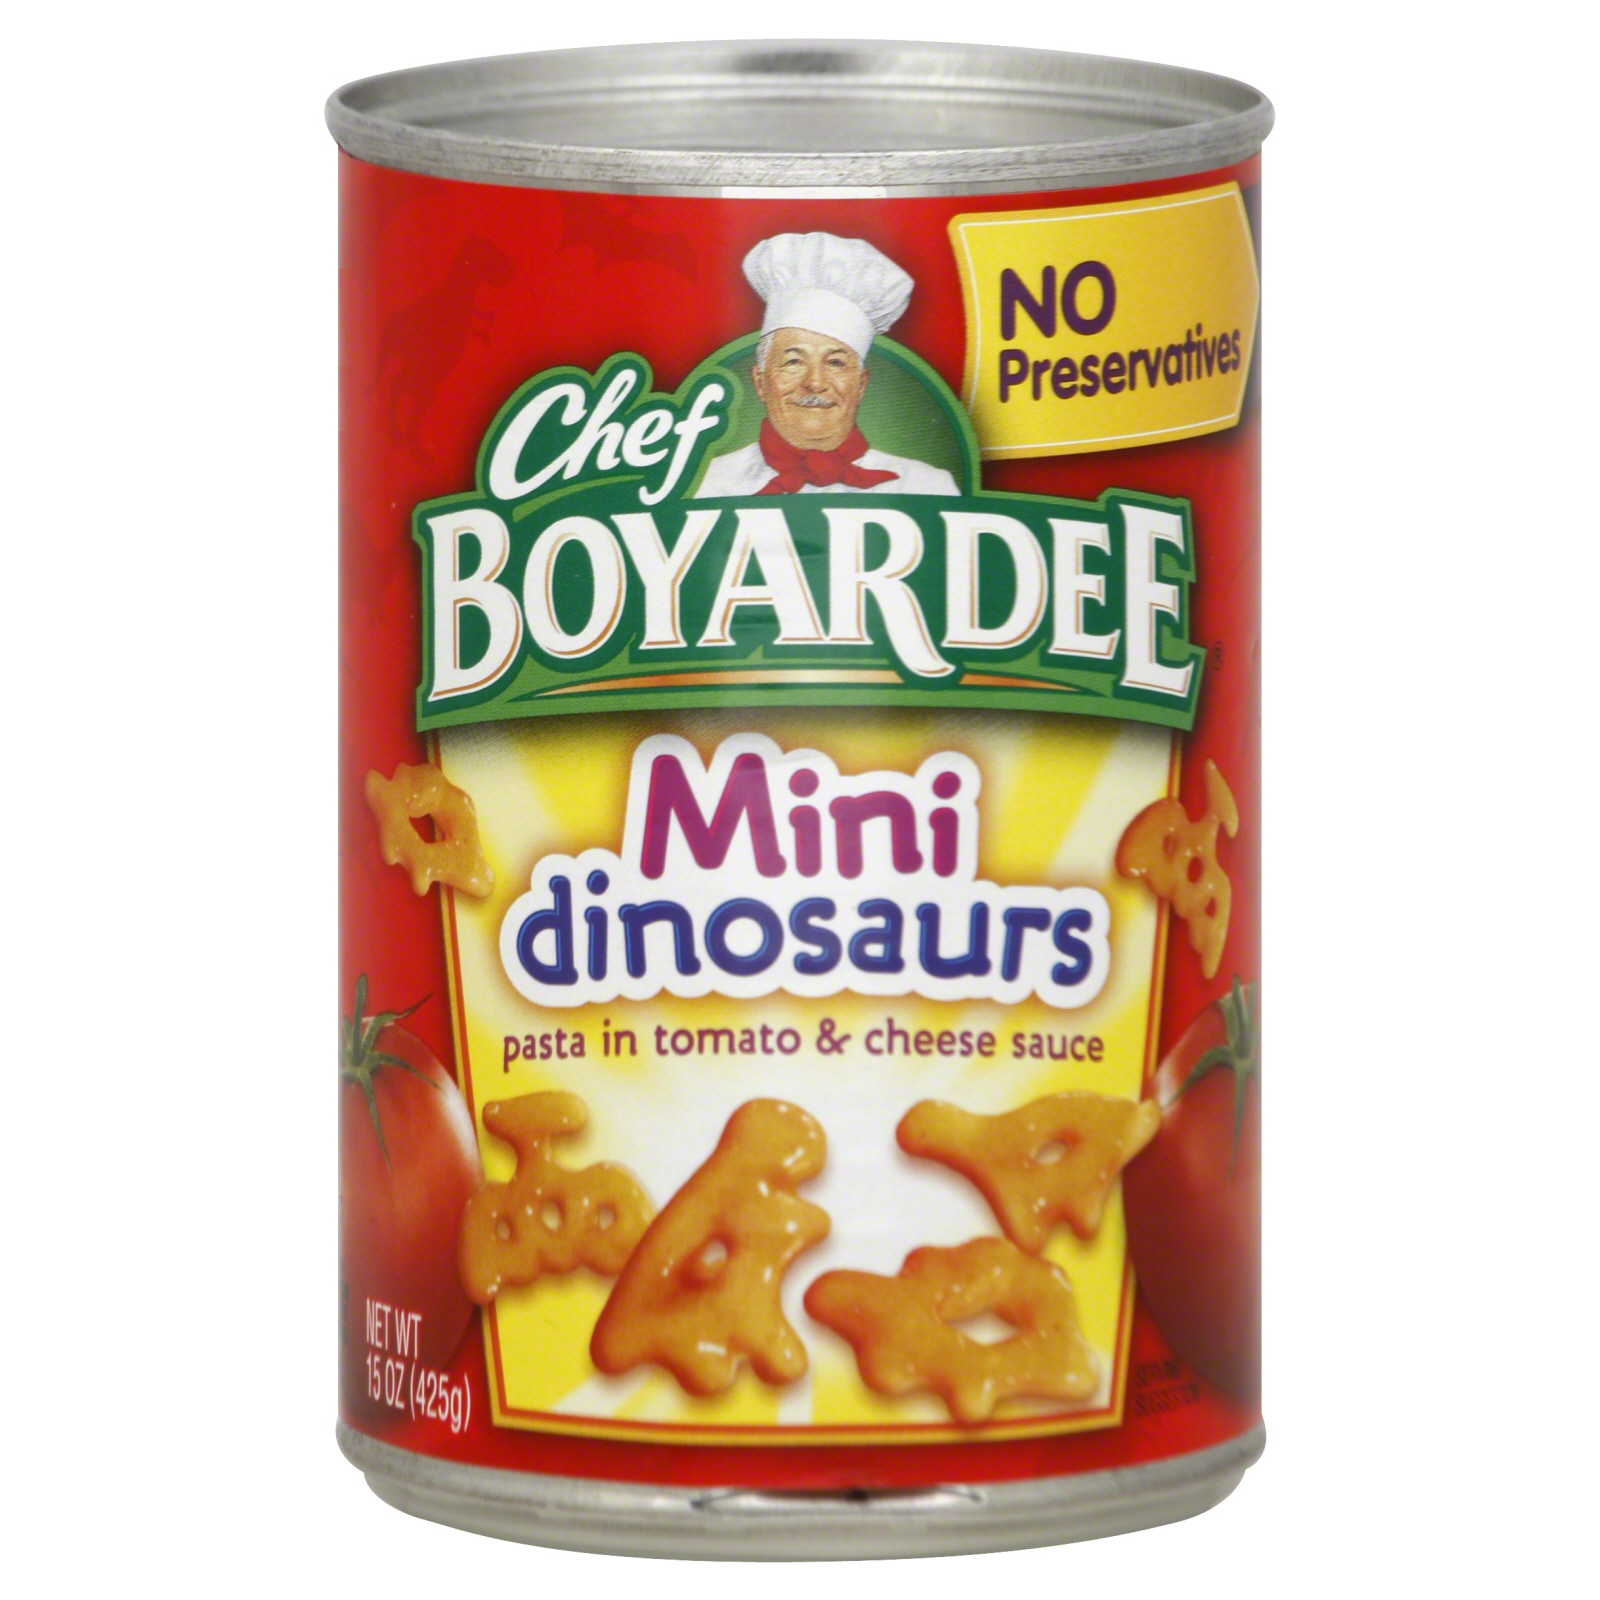 Chef Boyardee Mini Dinosaurs 15 oz 425 g Food